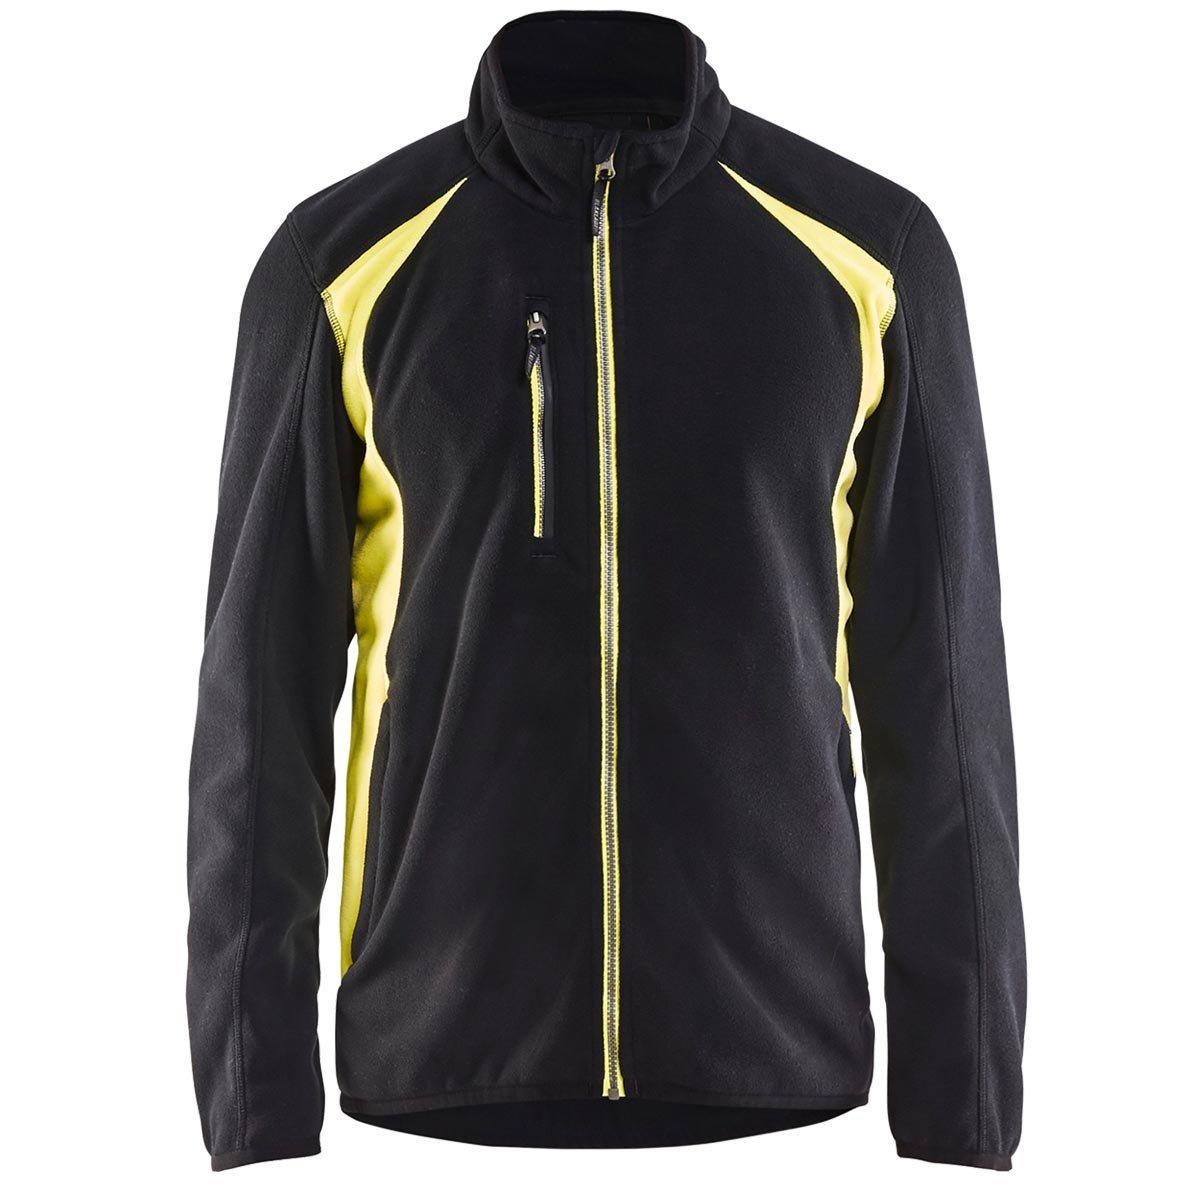 Blaklader Workwear Fleece Jacket Black//Yellow S